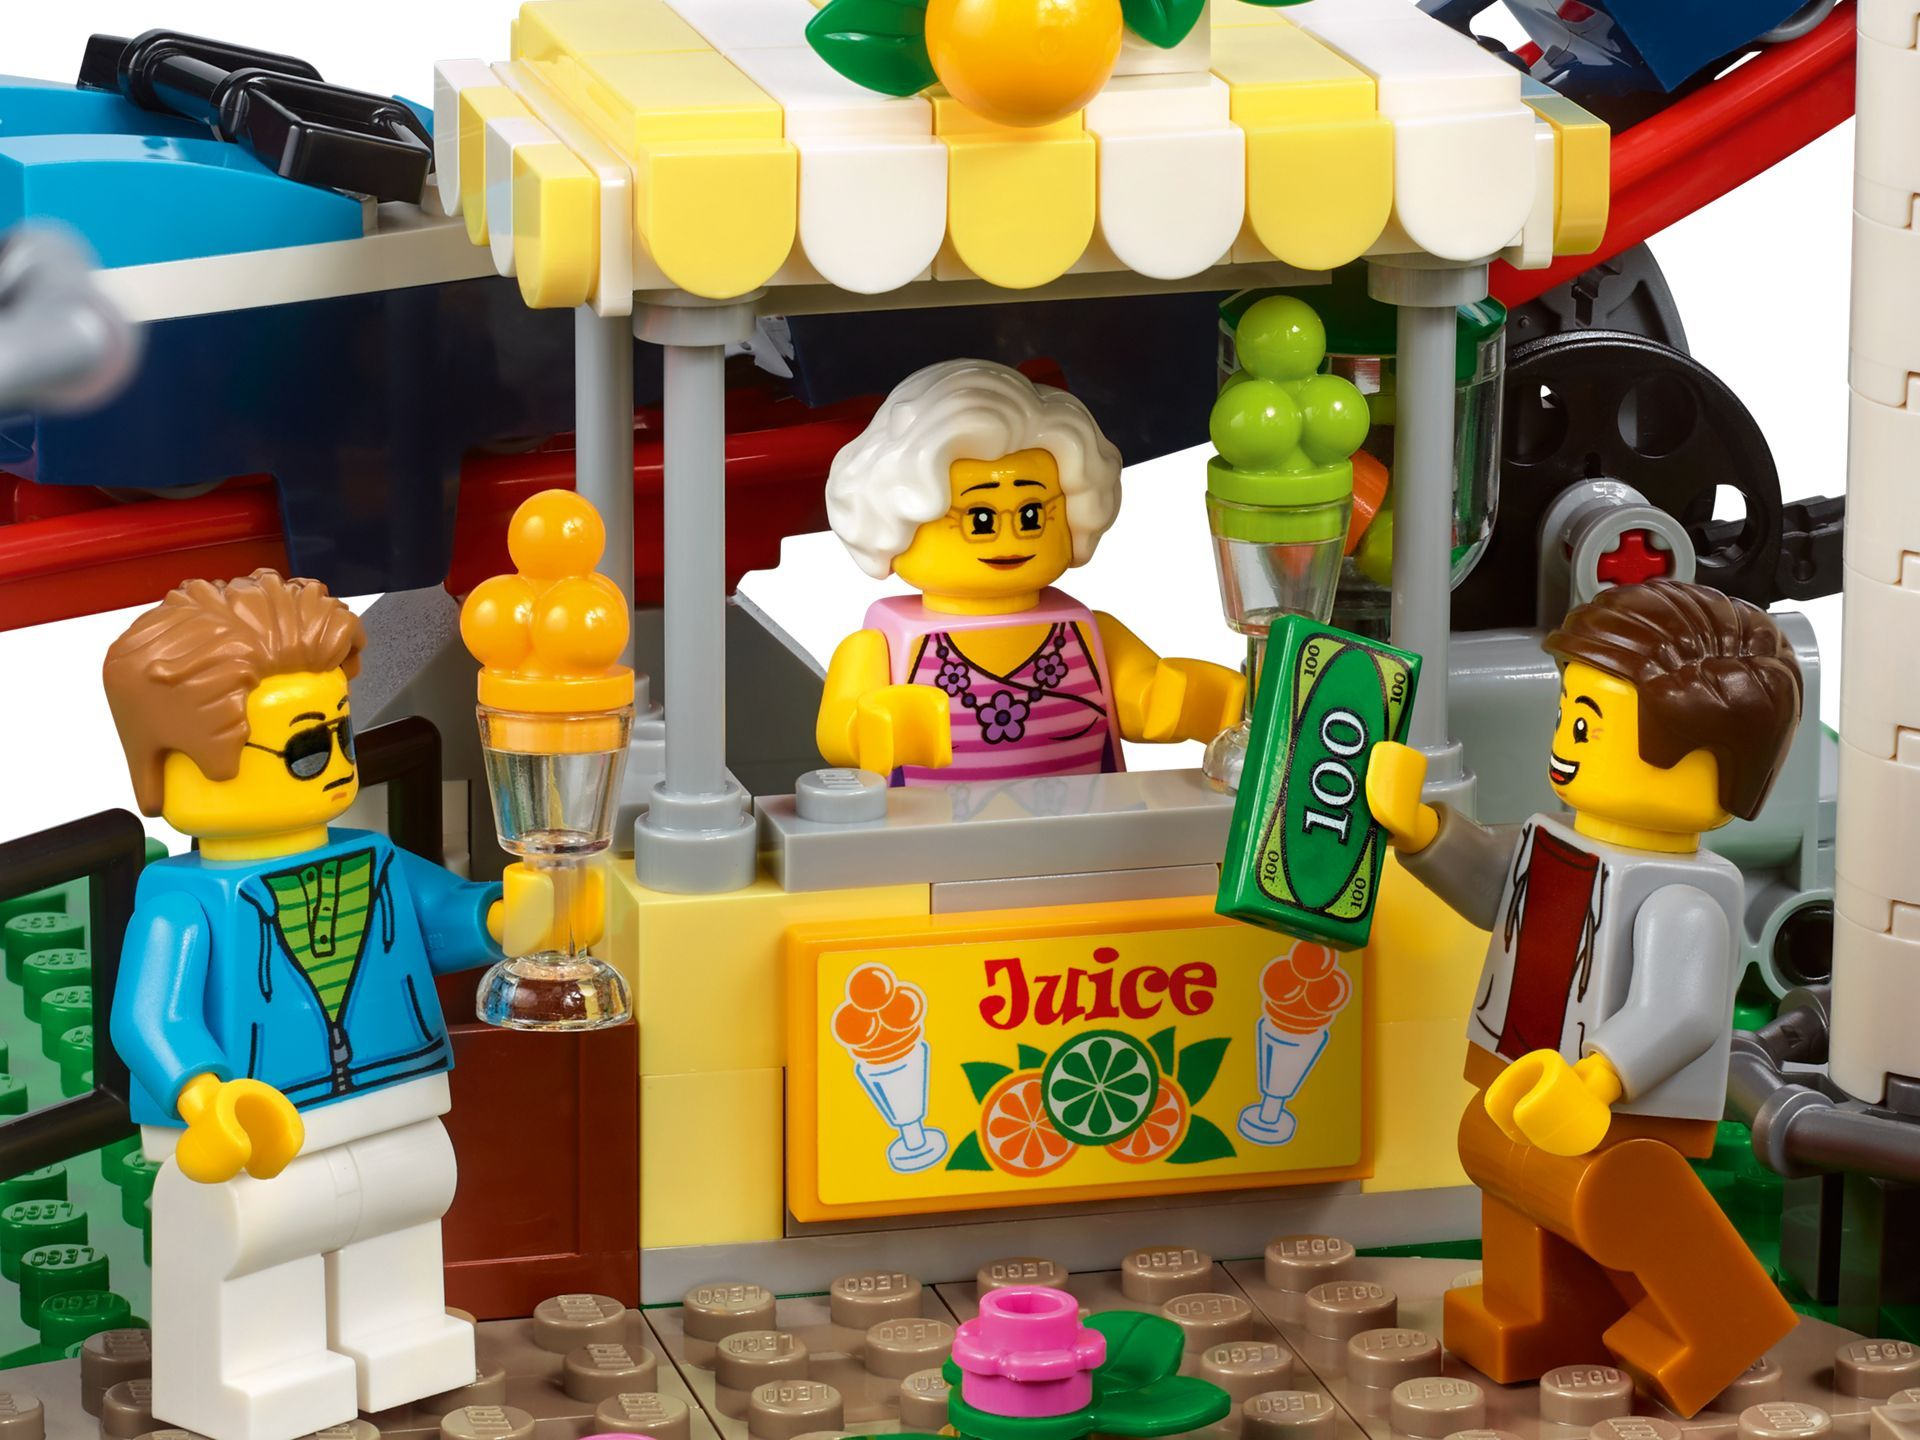 LEGO® Creator Expert Achterbahn (10261) - Bild 06 | ©LEGO Gruppe